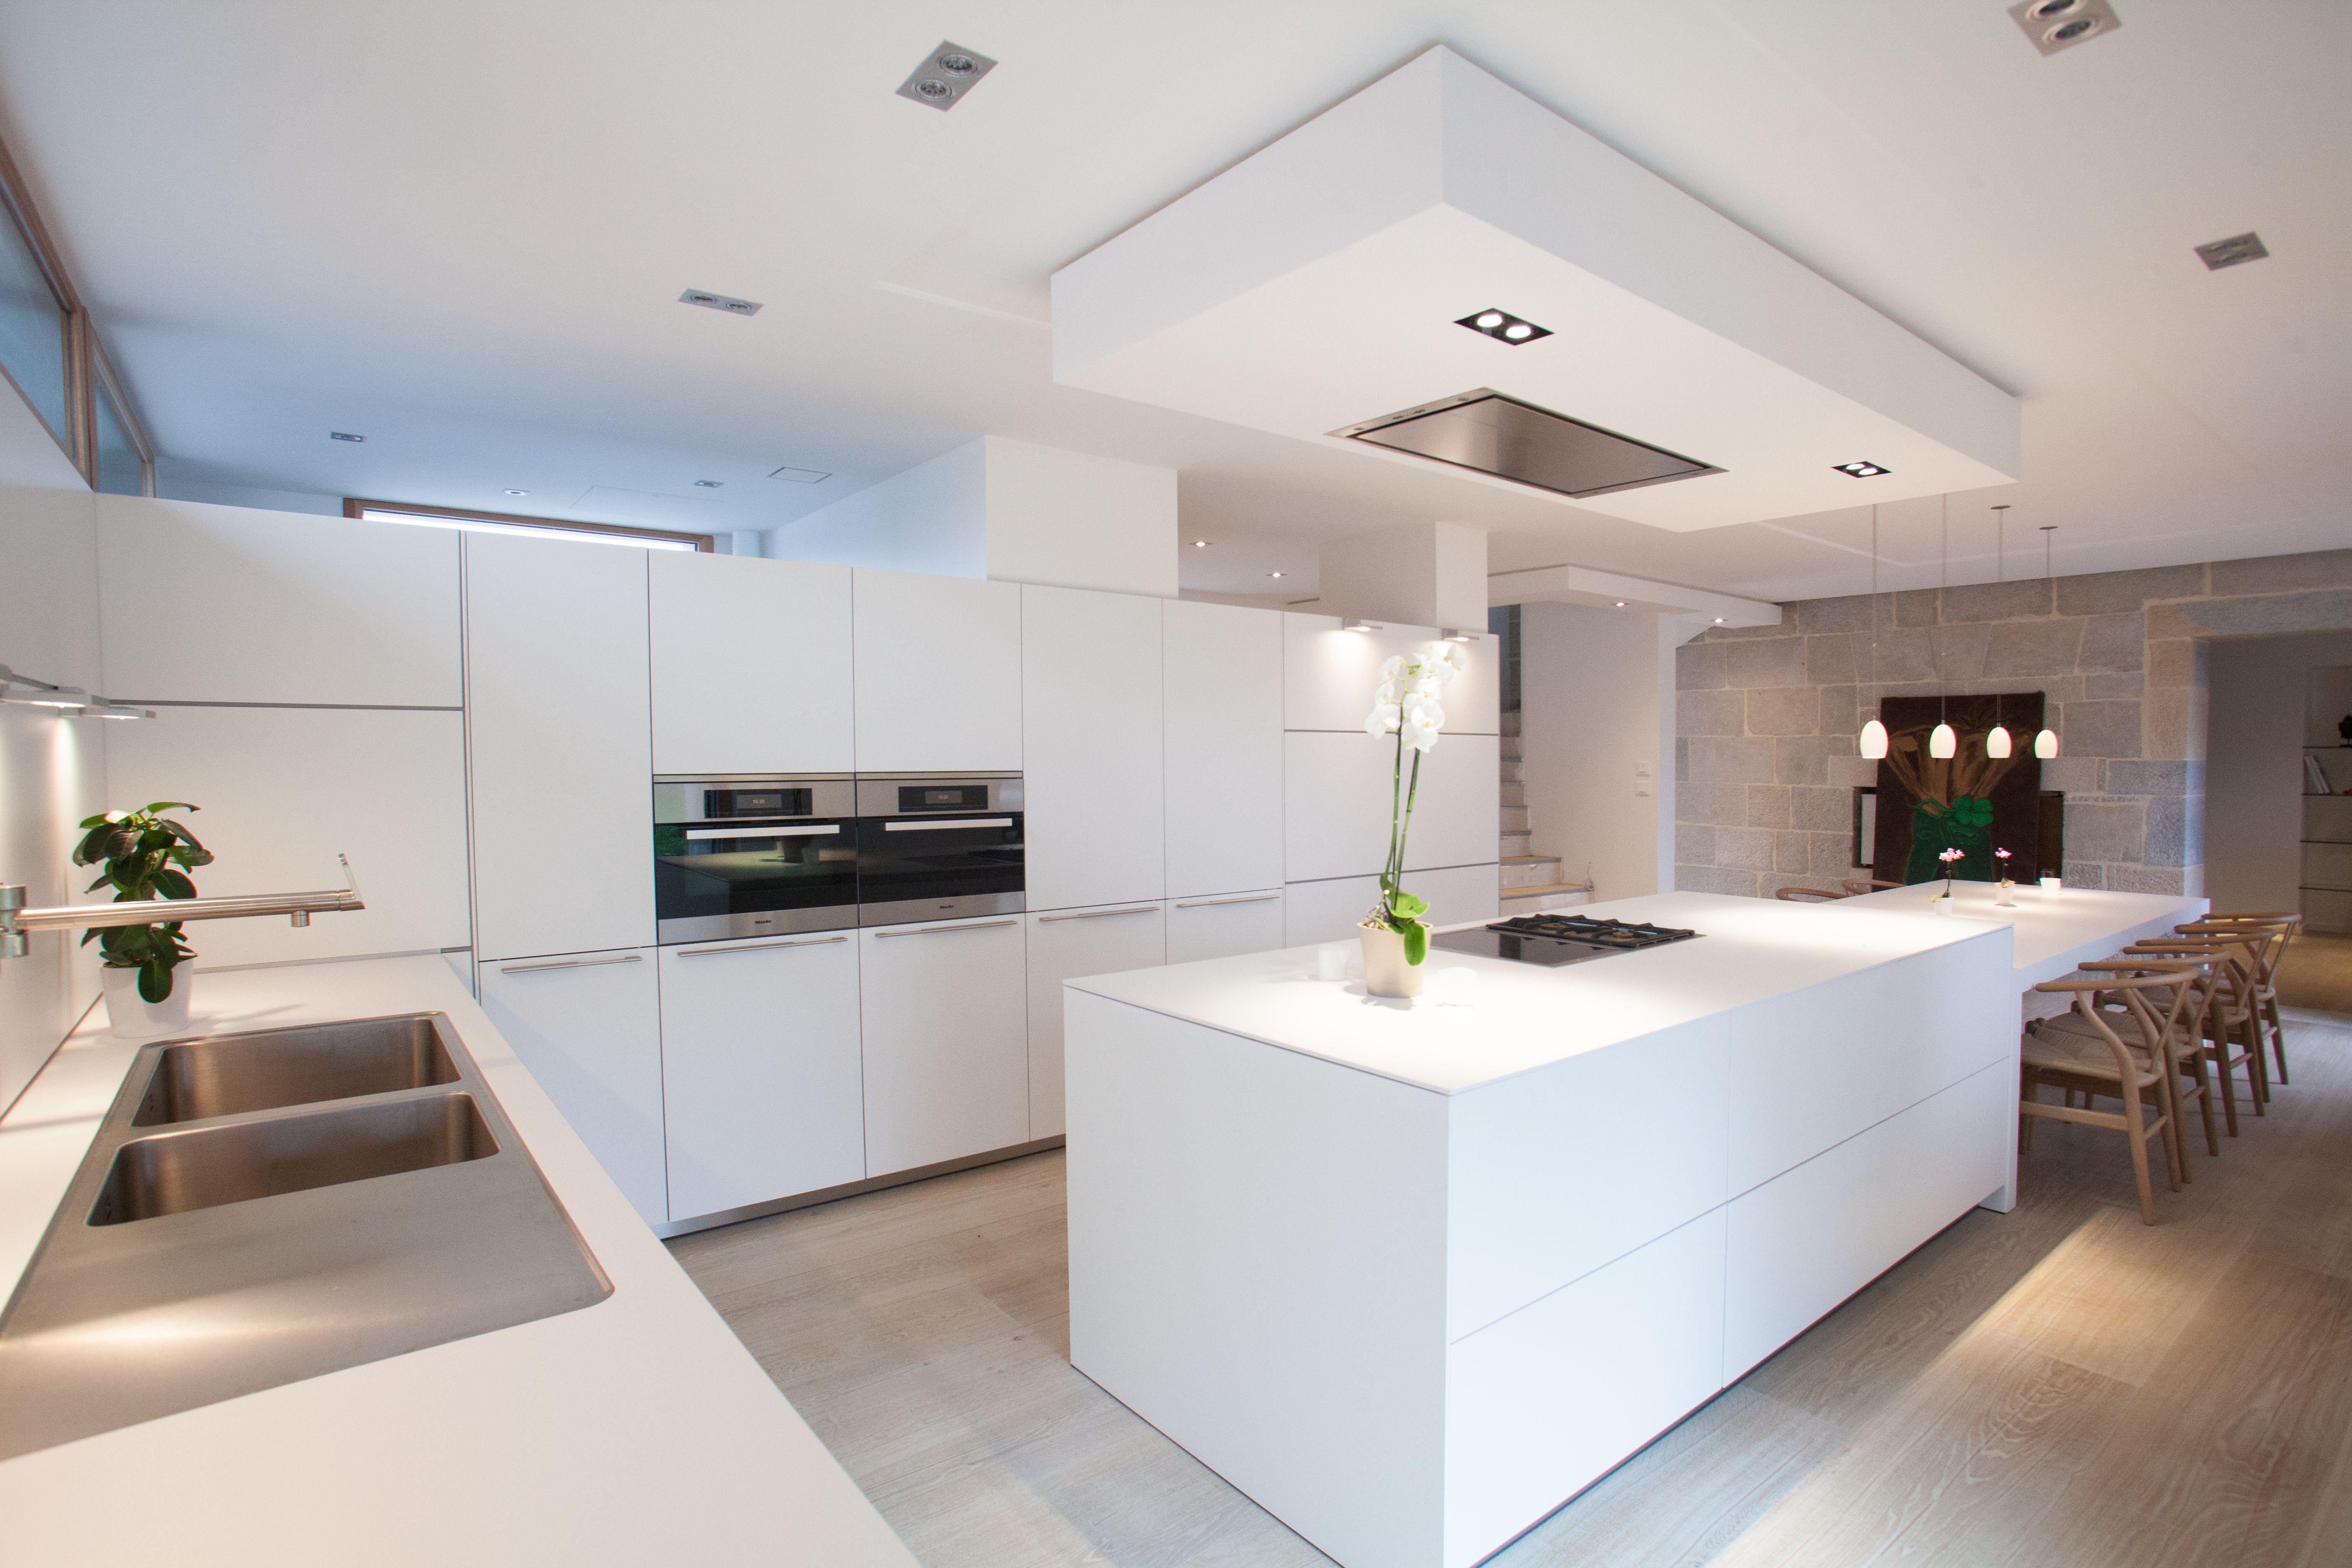 Cuisine bulthaup b3 stratifié blanc alpin modern kitchen in 2018